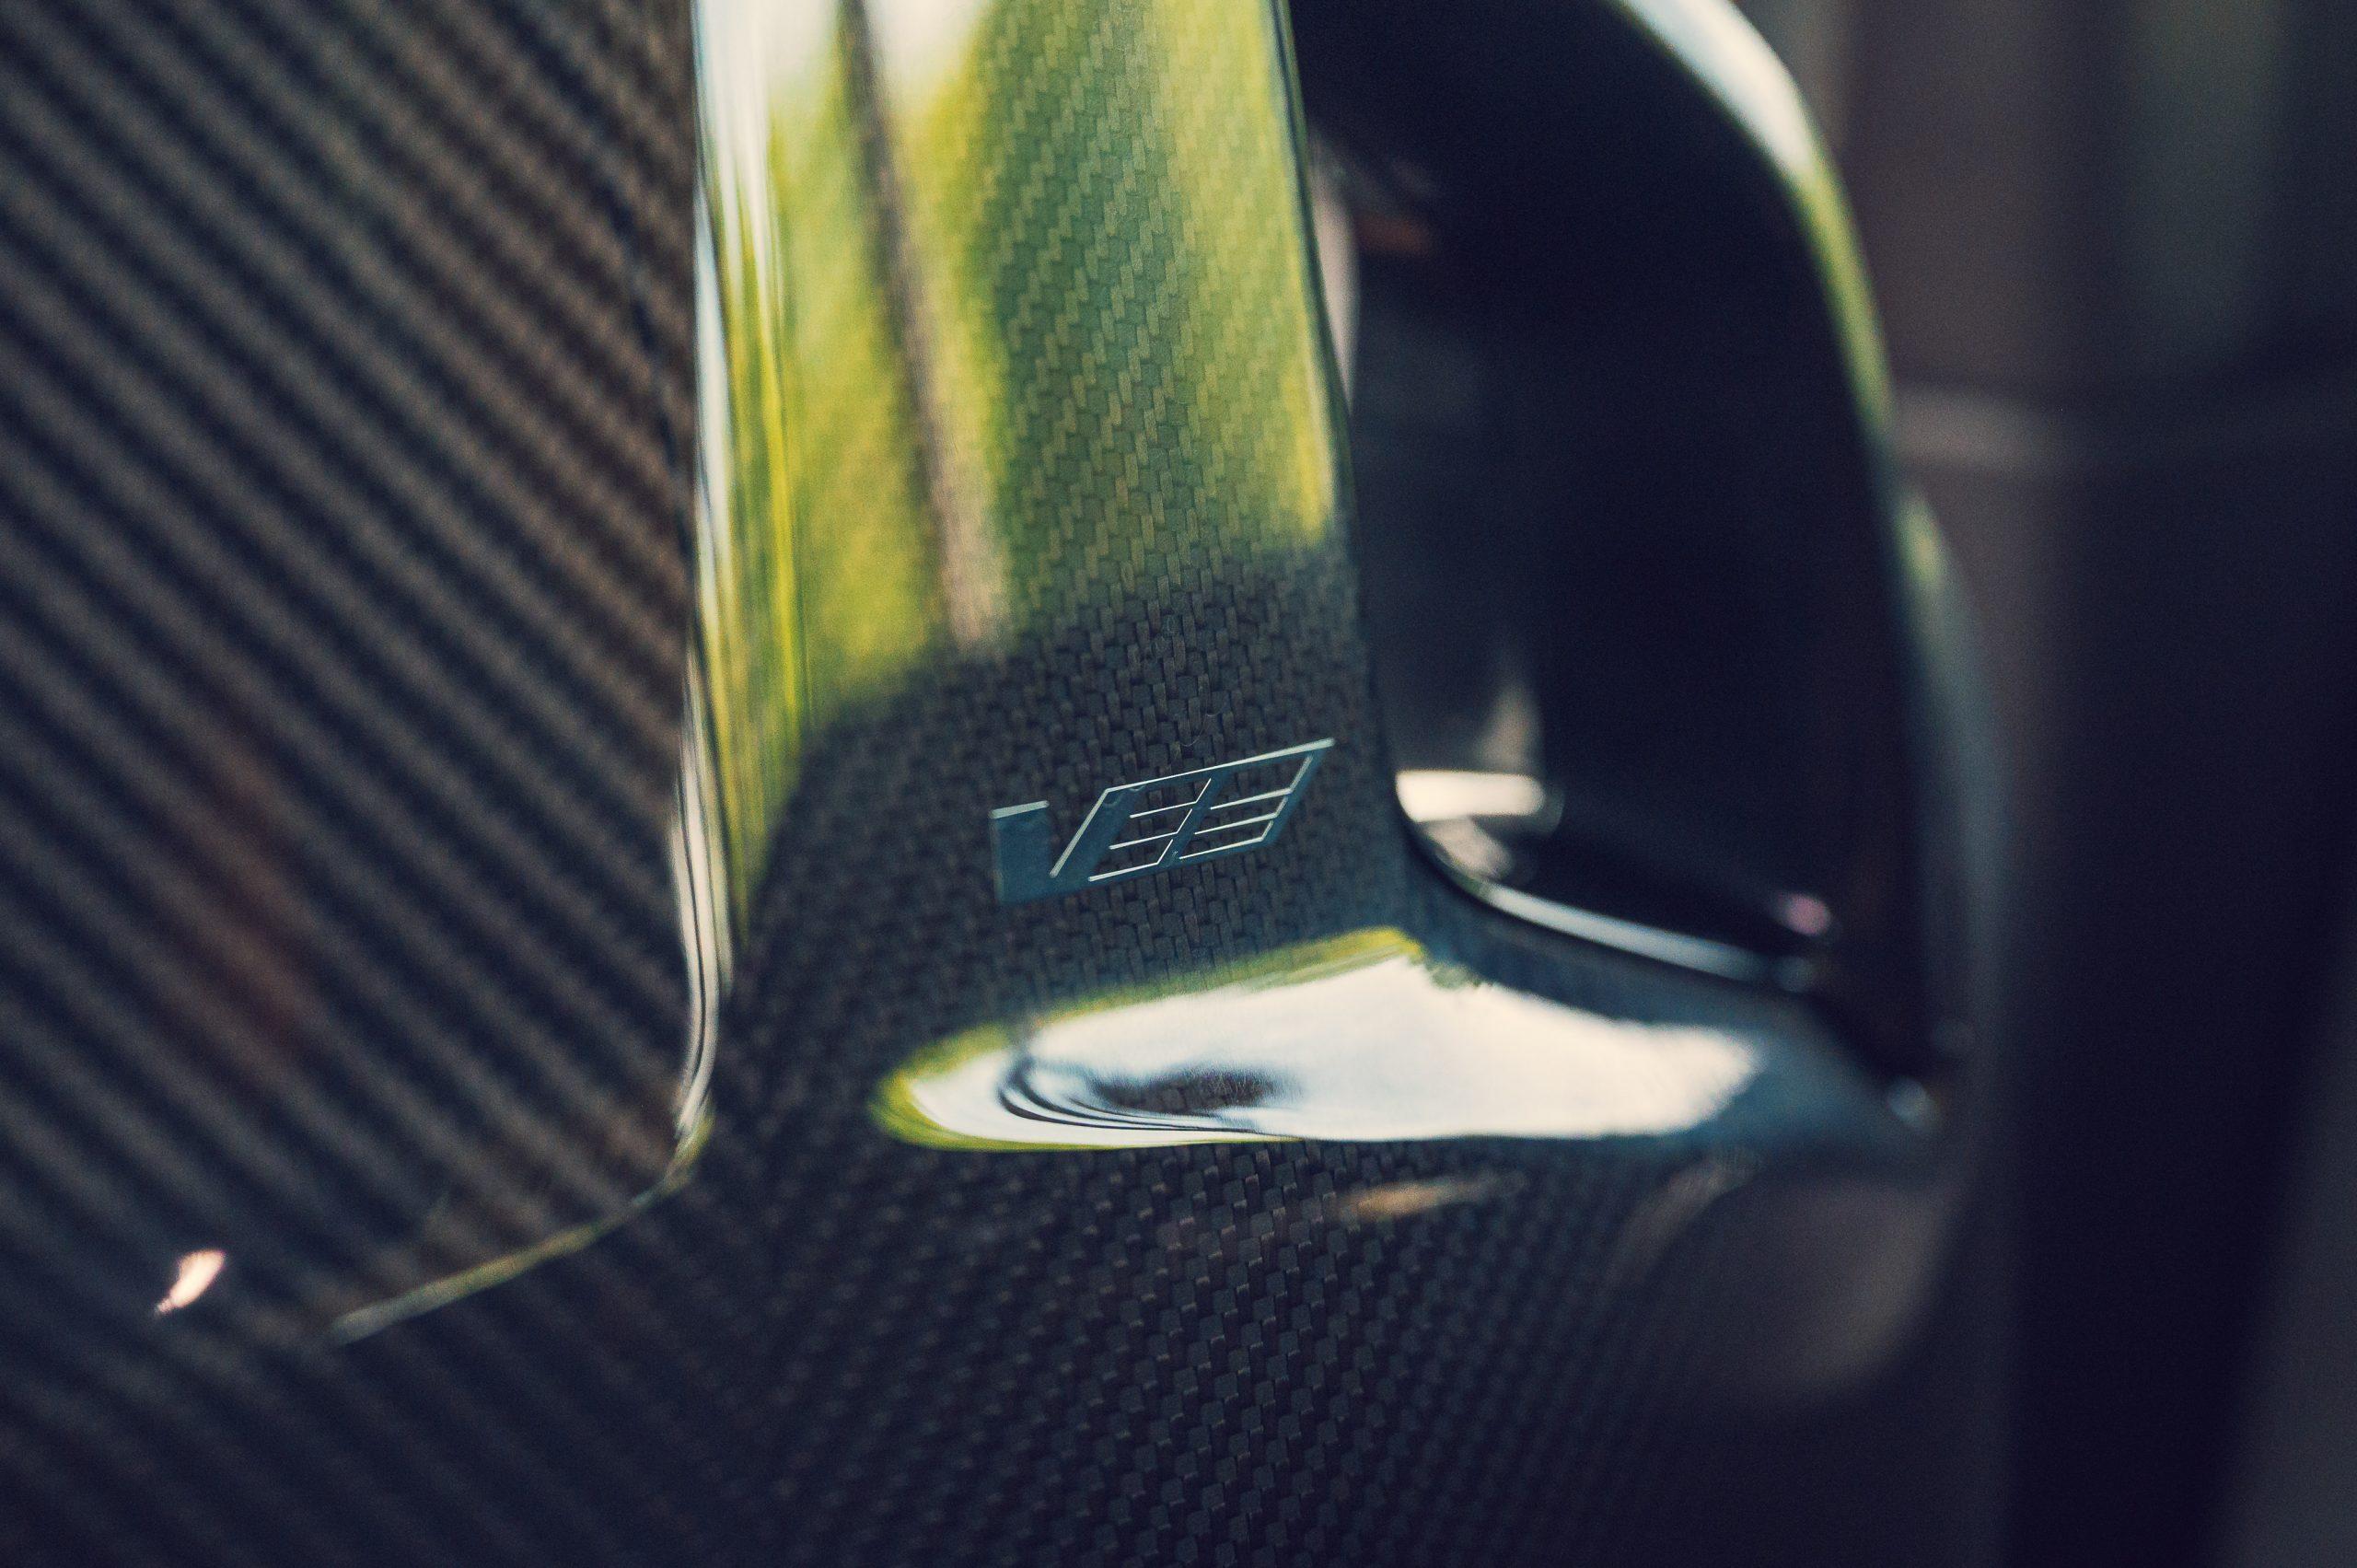 2022 Cadillac CT5-V Blackwing carbon badge detail